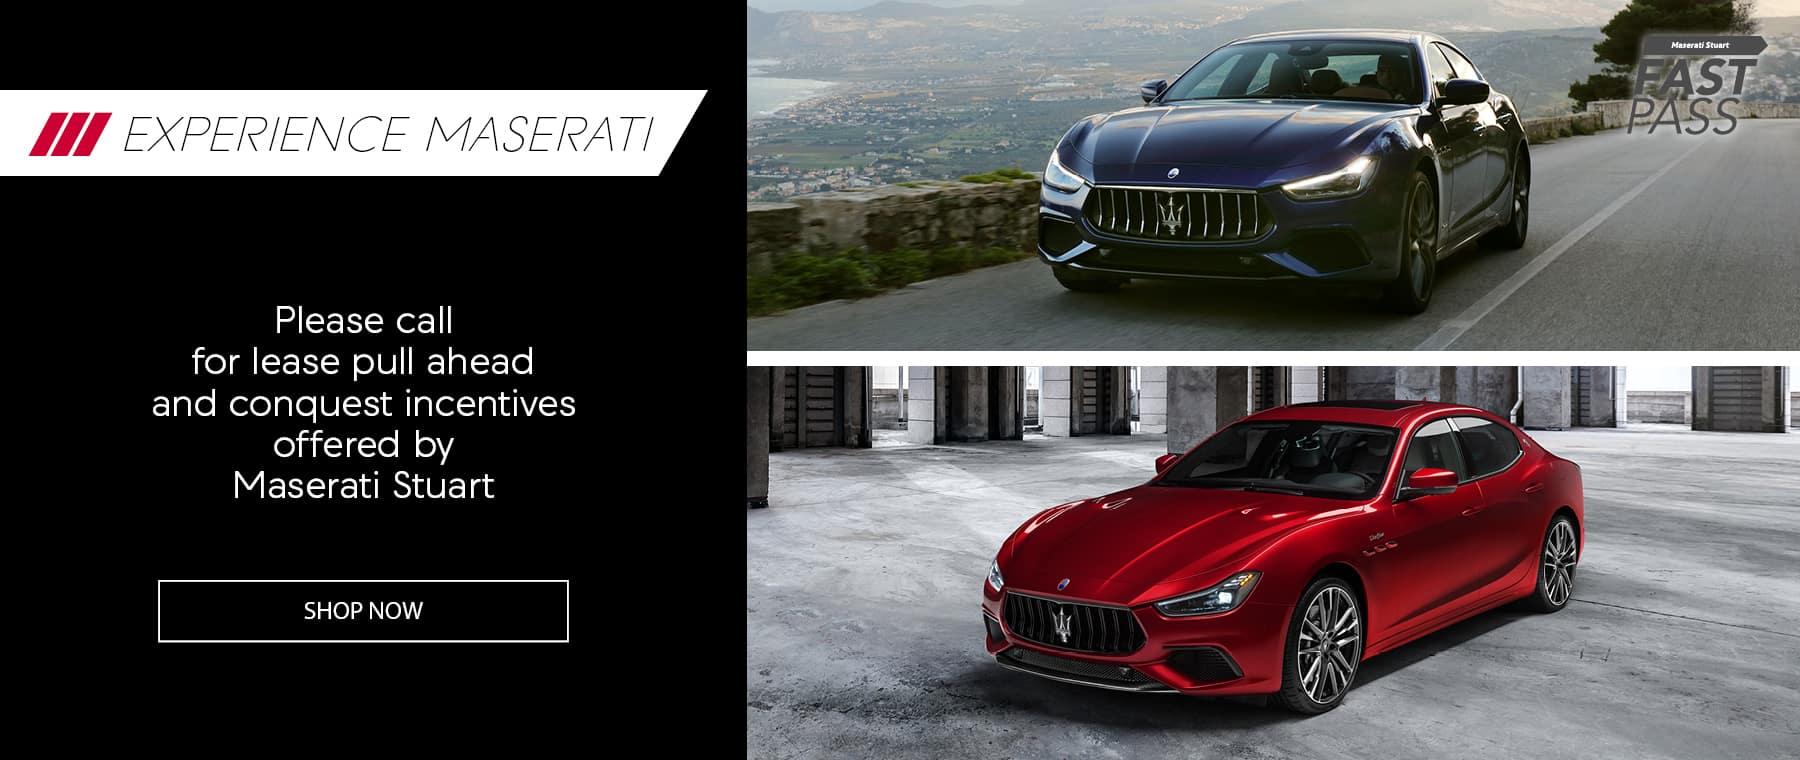 MaseratiStuart_ExperienceMaserti_WB_Mar2021 200796